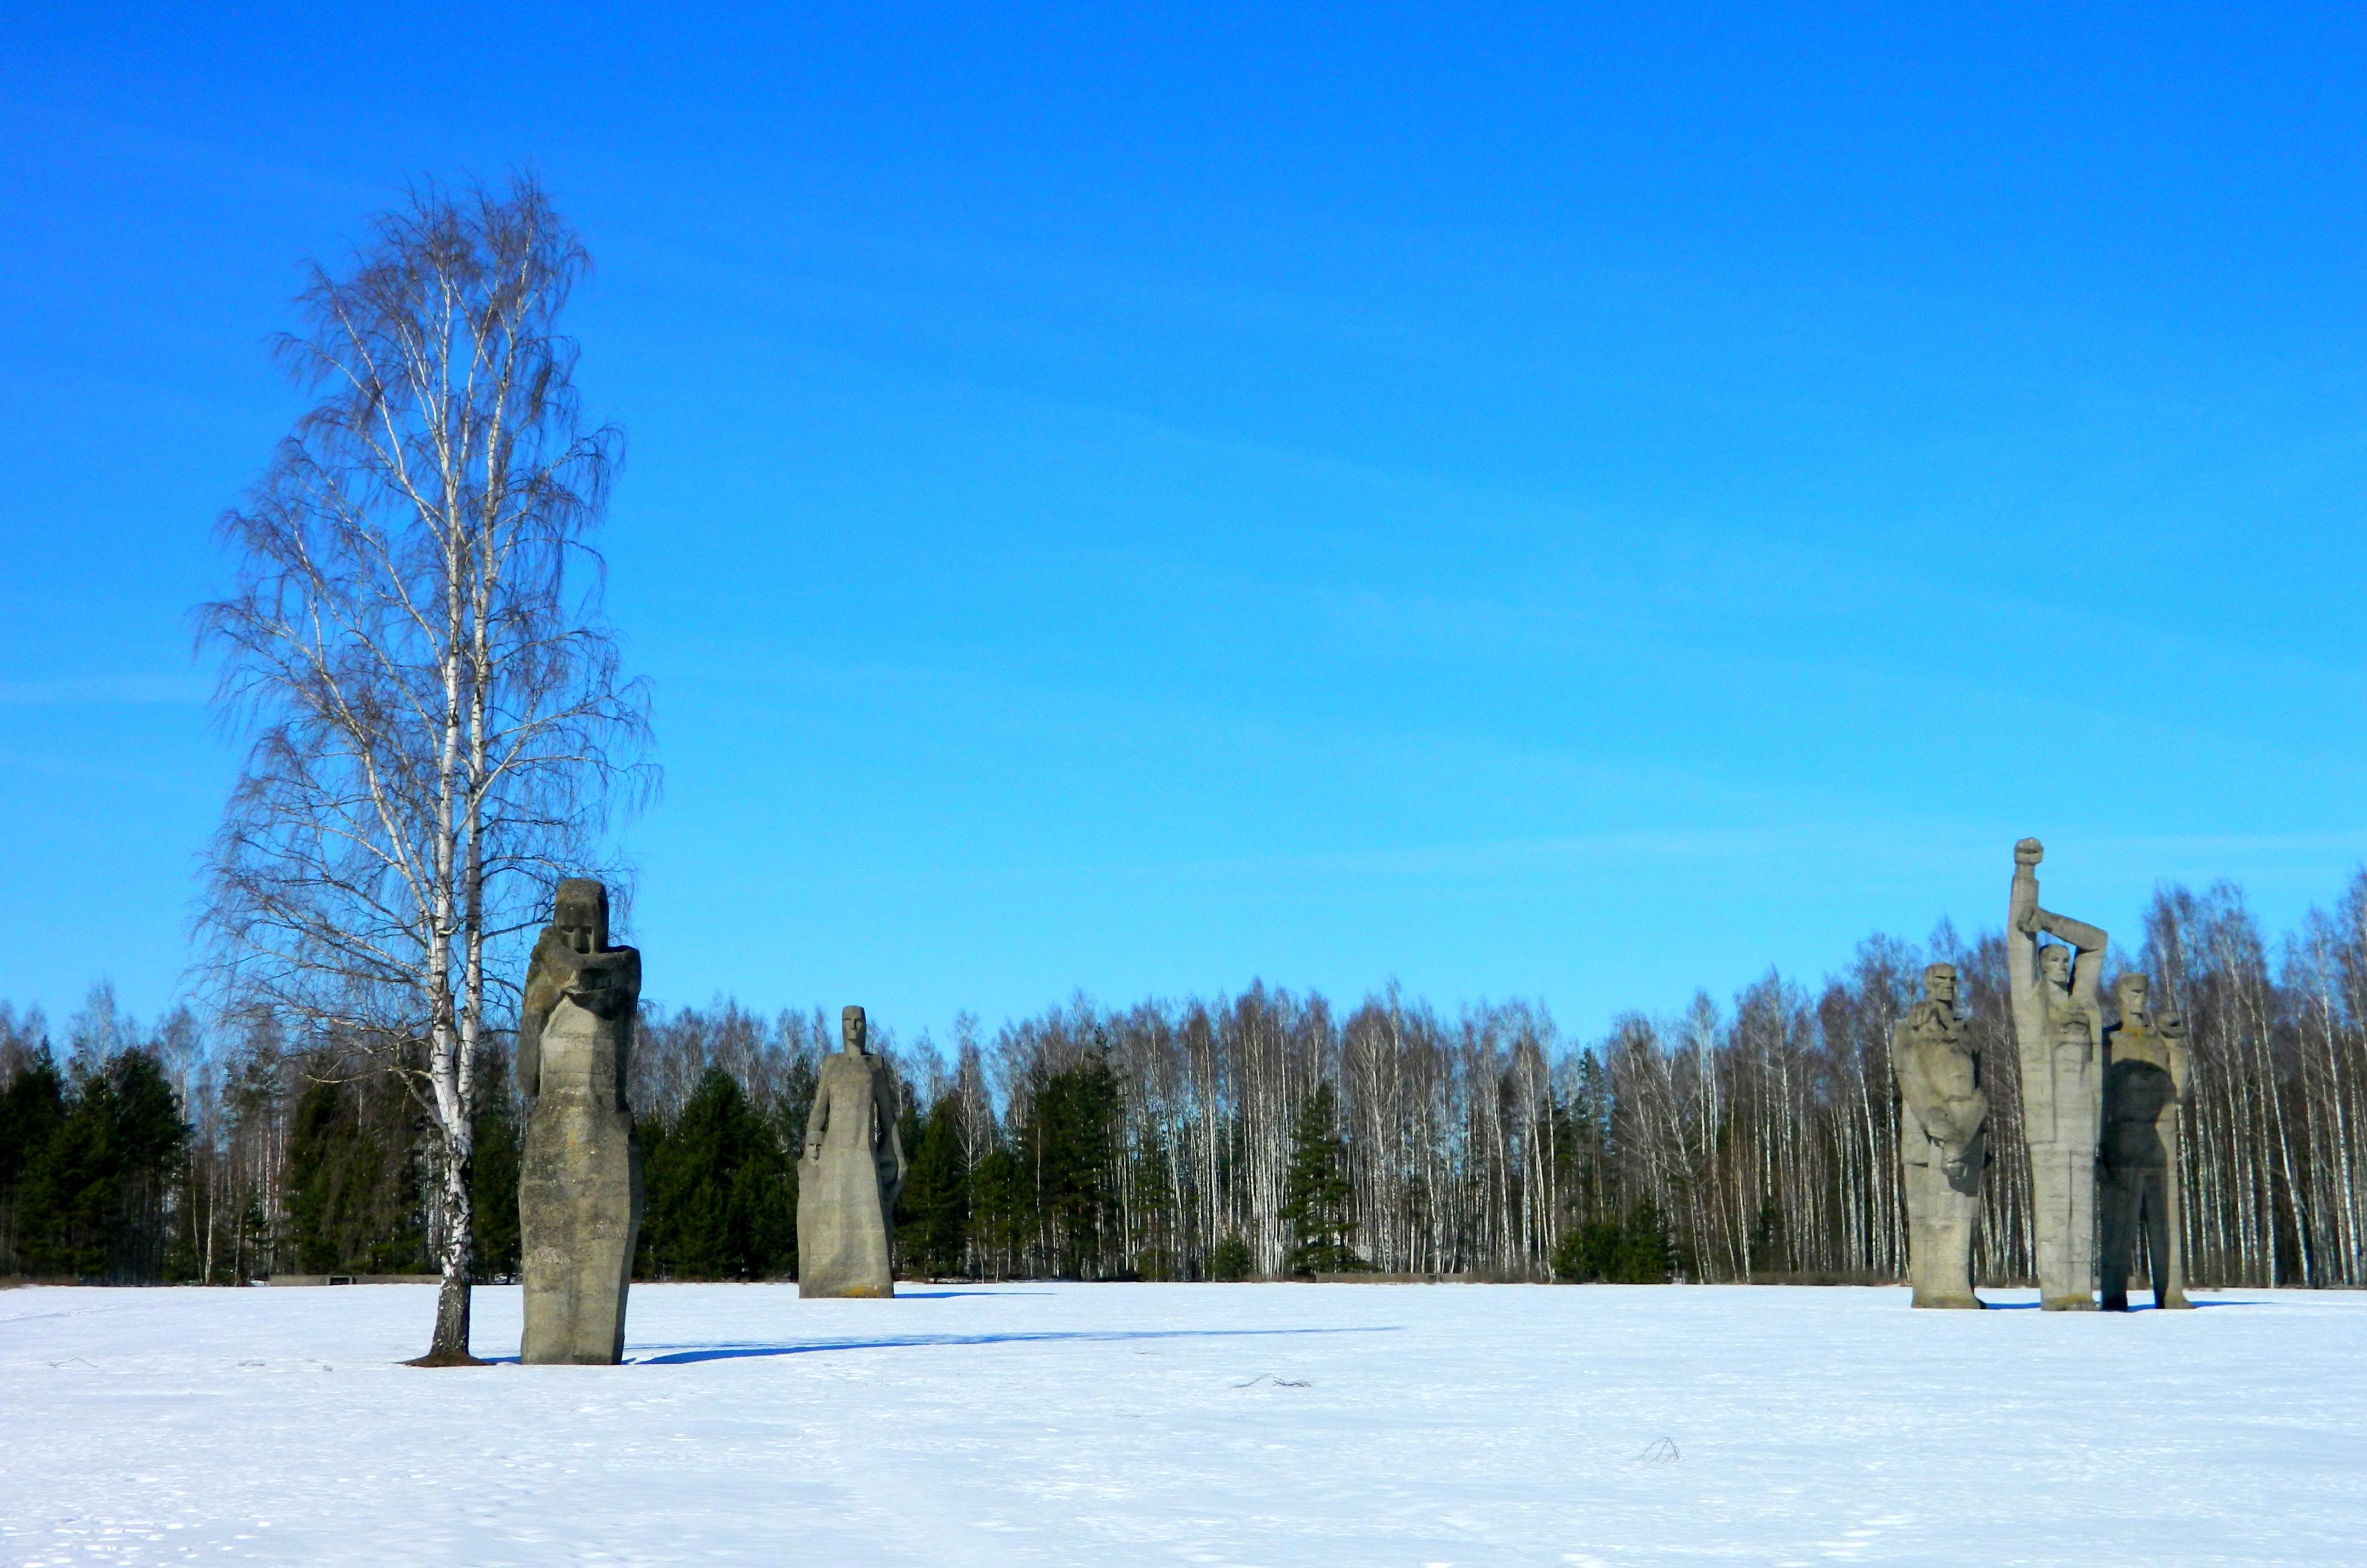 https://mosereien.files.wordpress.com/2014/01/salaspils-memorial-snow.jpg